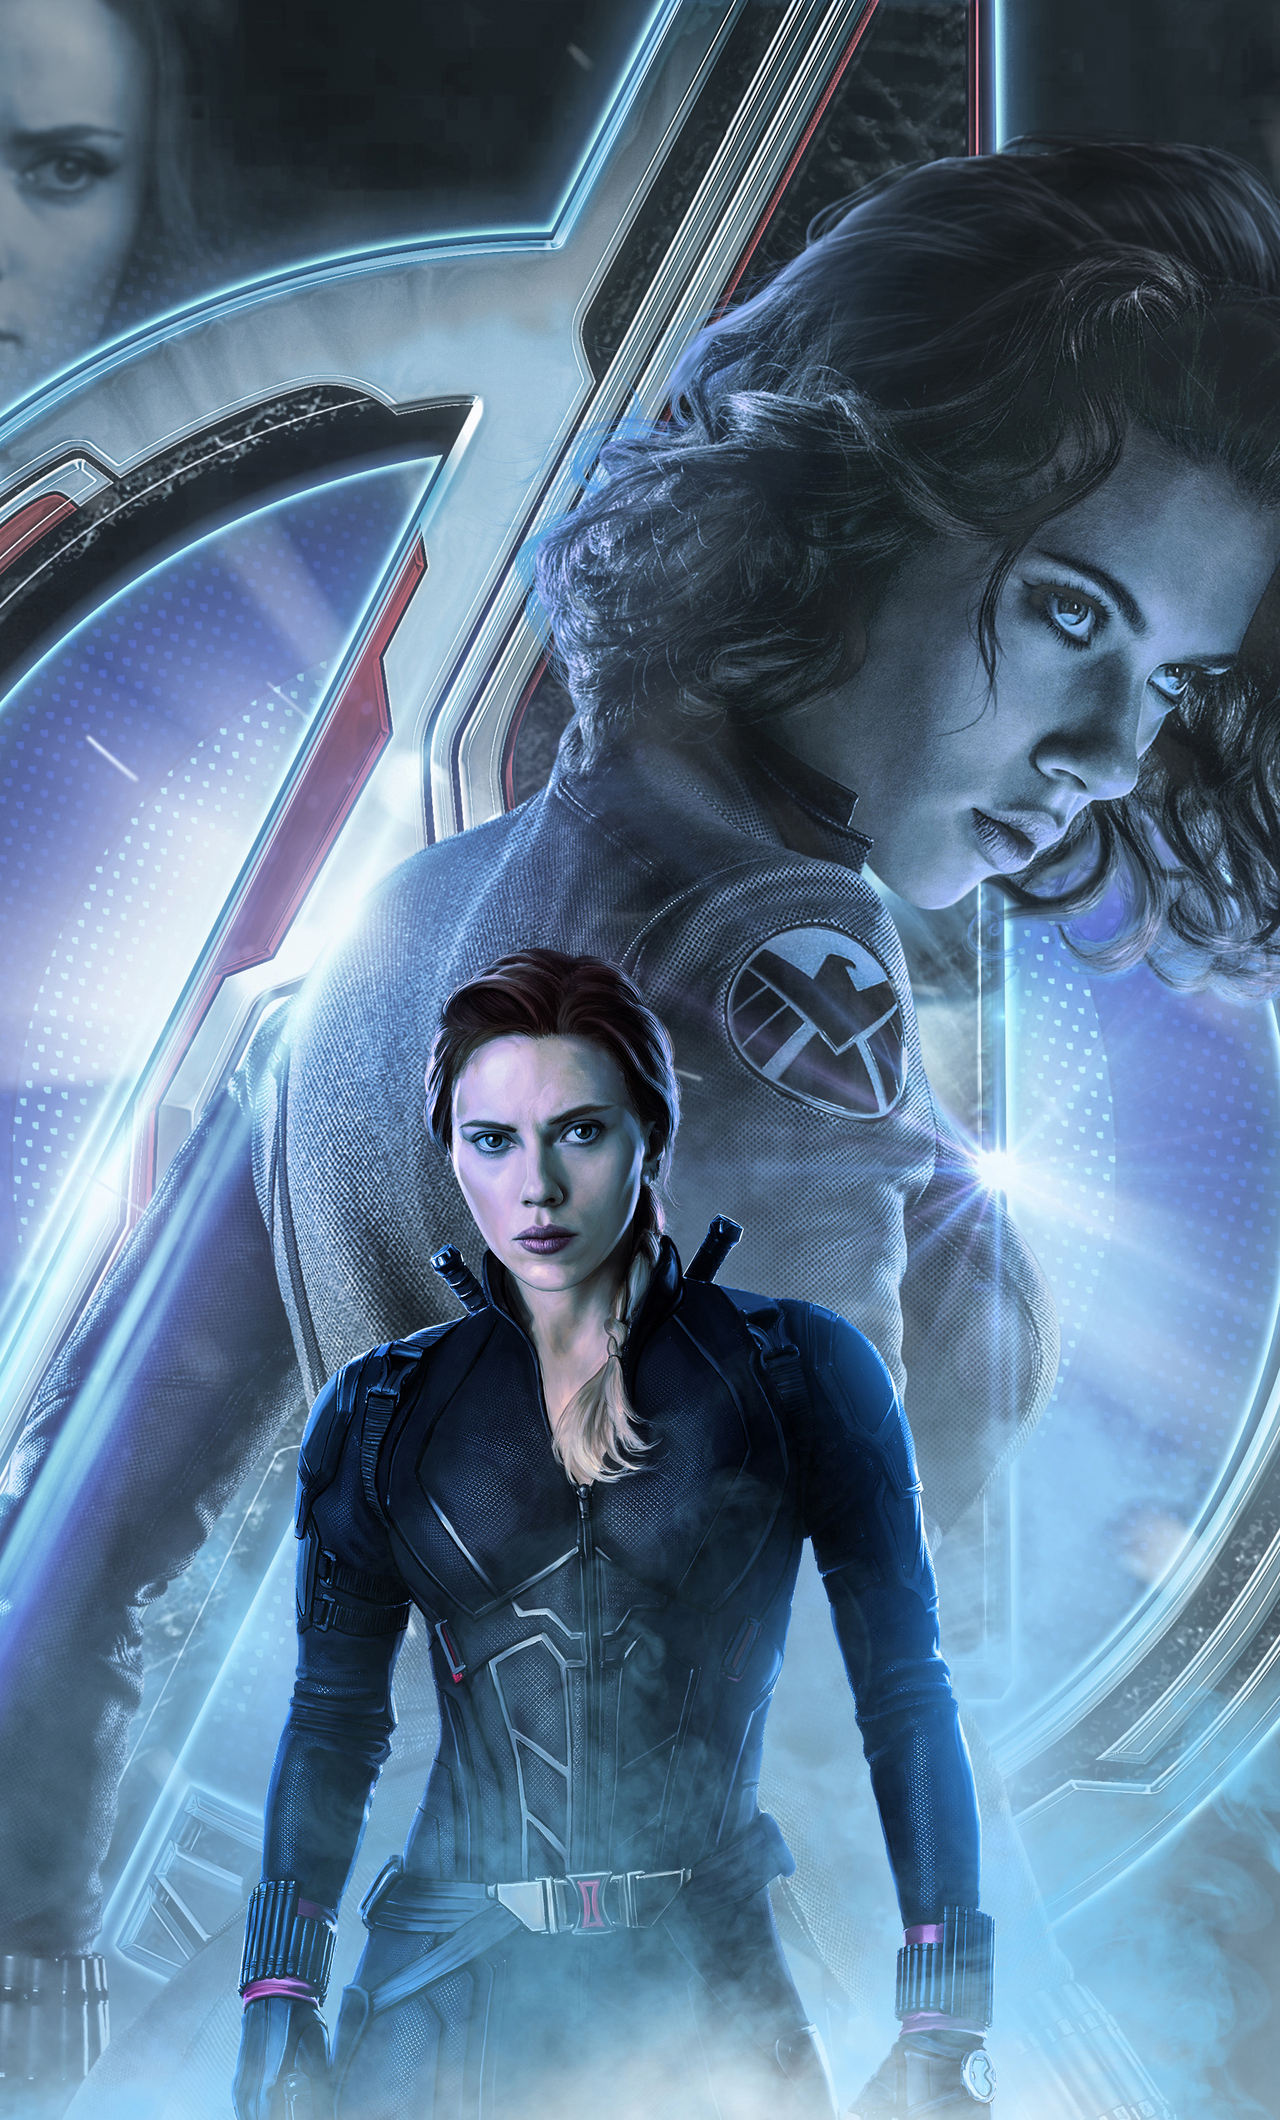 1280x2120 Black Widow In Avengers Endgame 2019 iPhone 6 ...